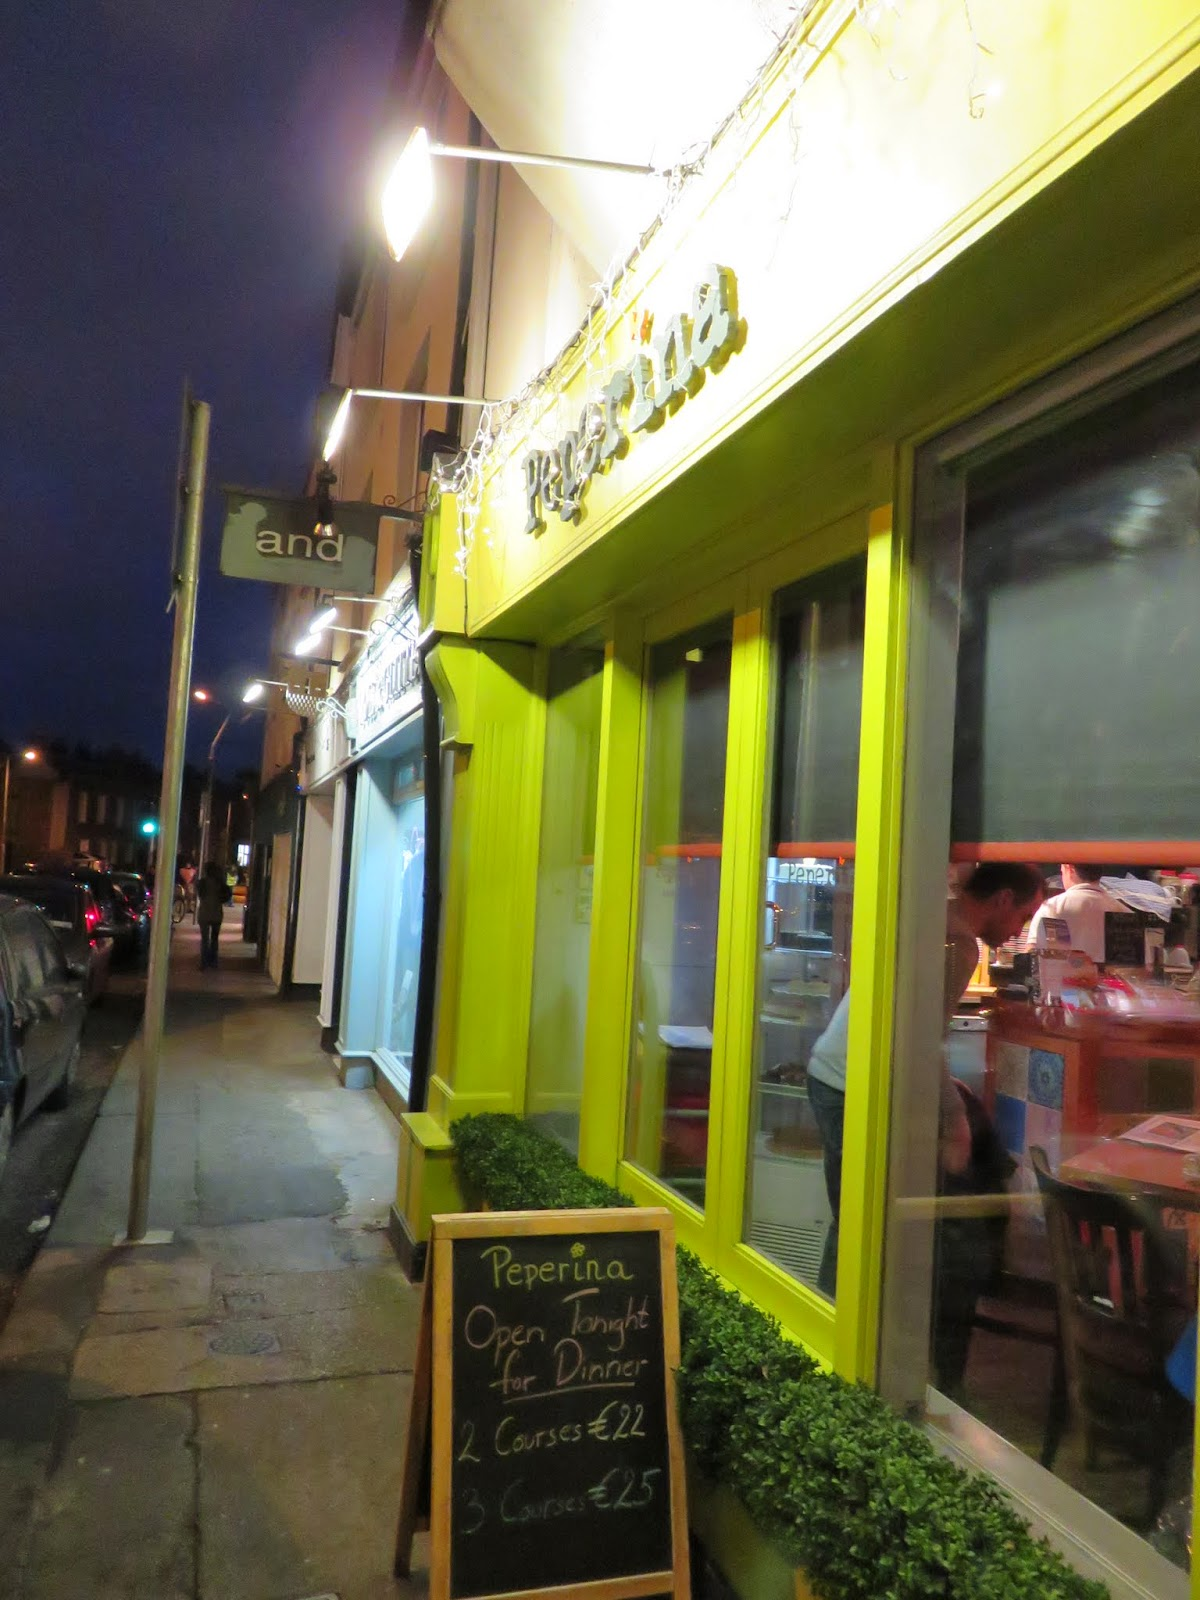 Peperina Garden Bistro in Dublin